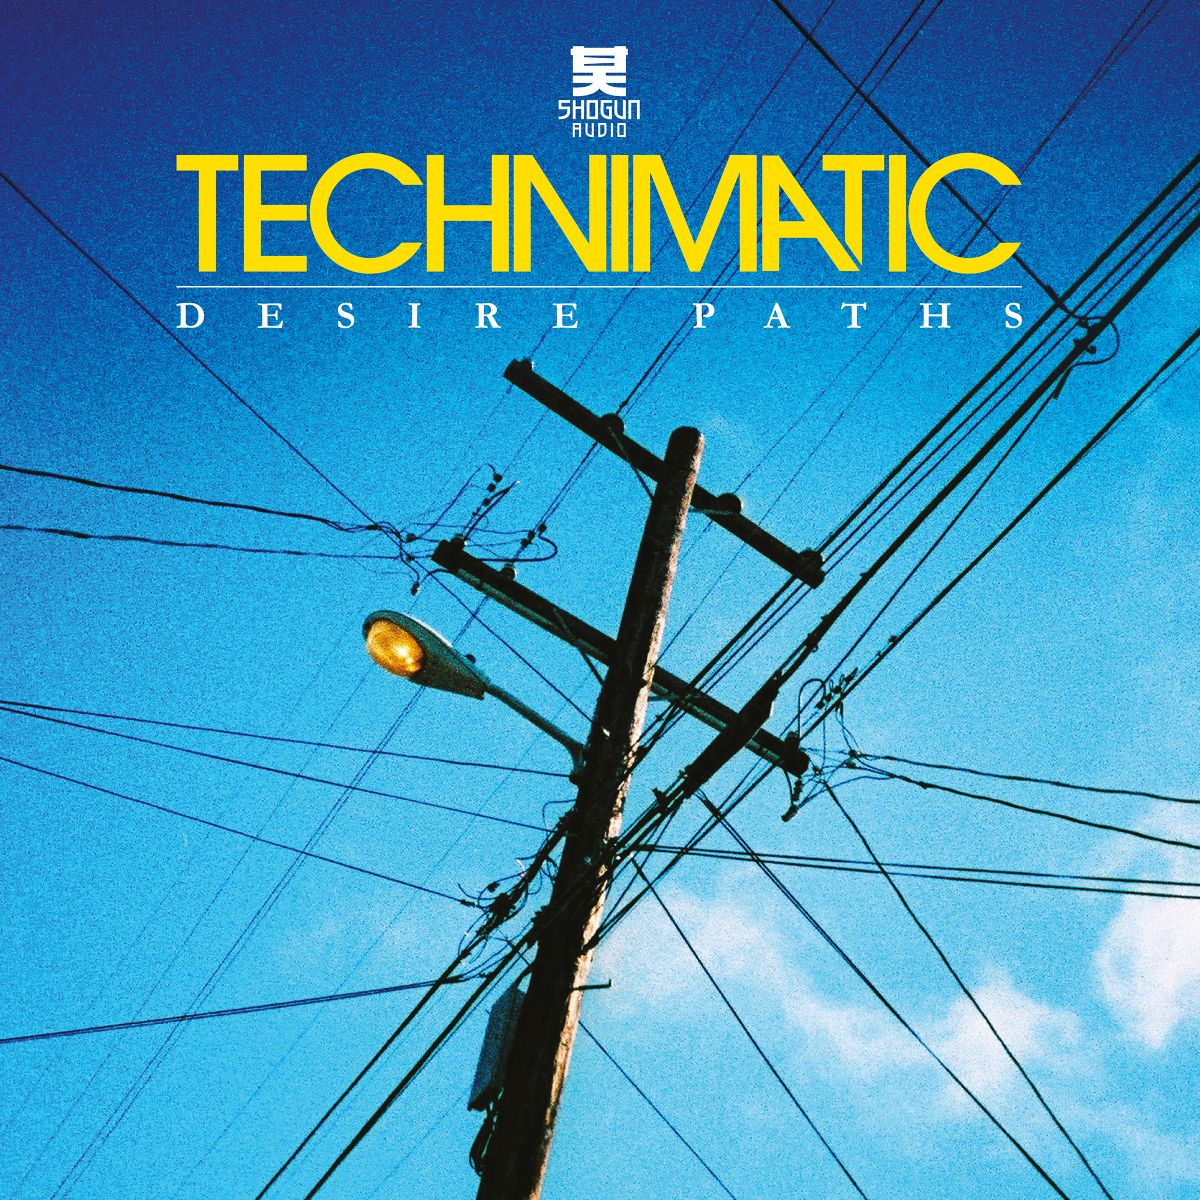 Technimatic/DESIRE PATHS CD